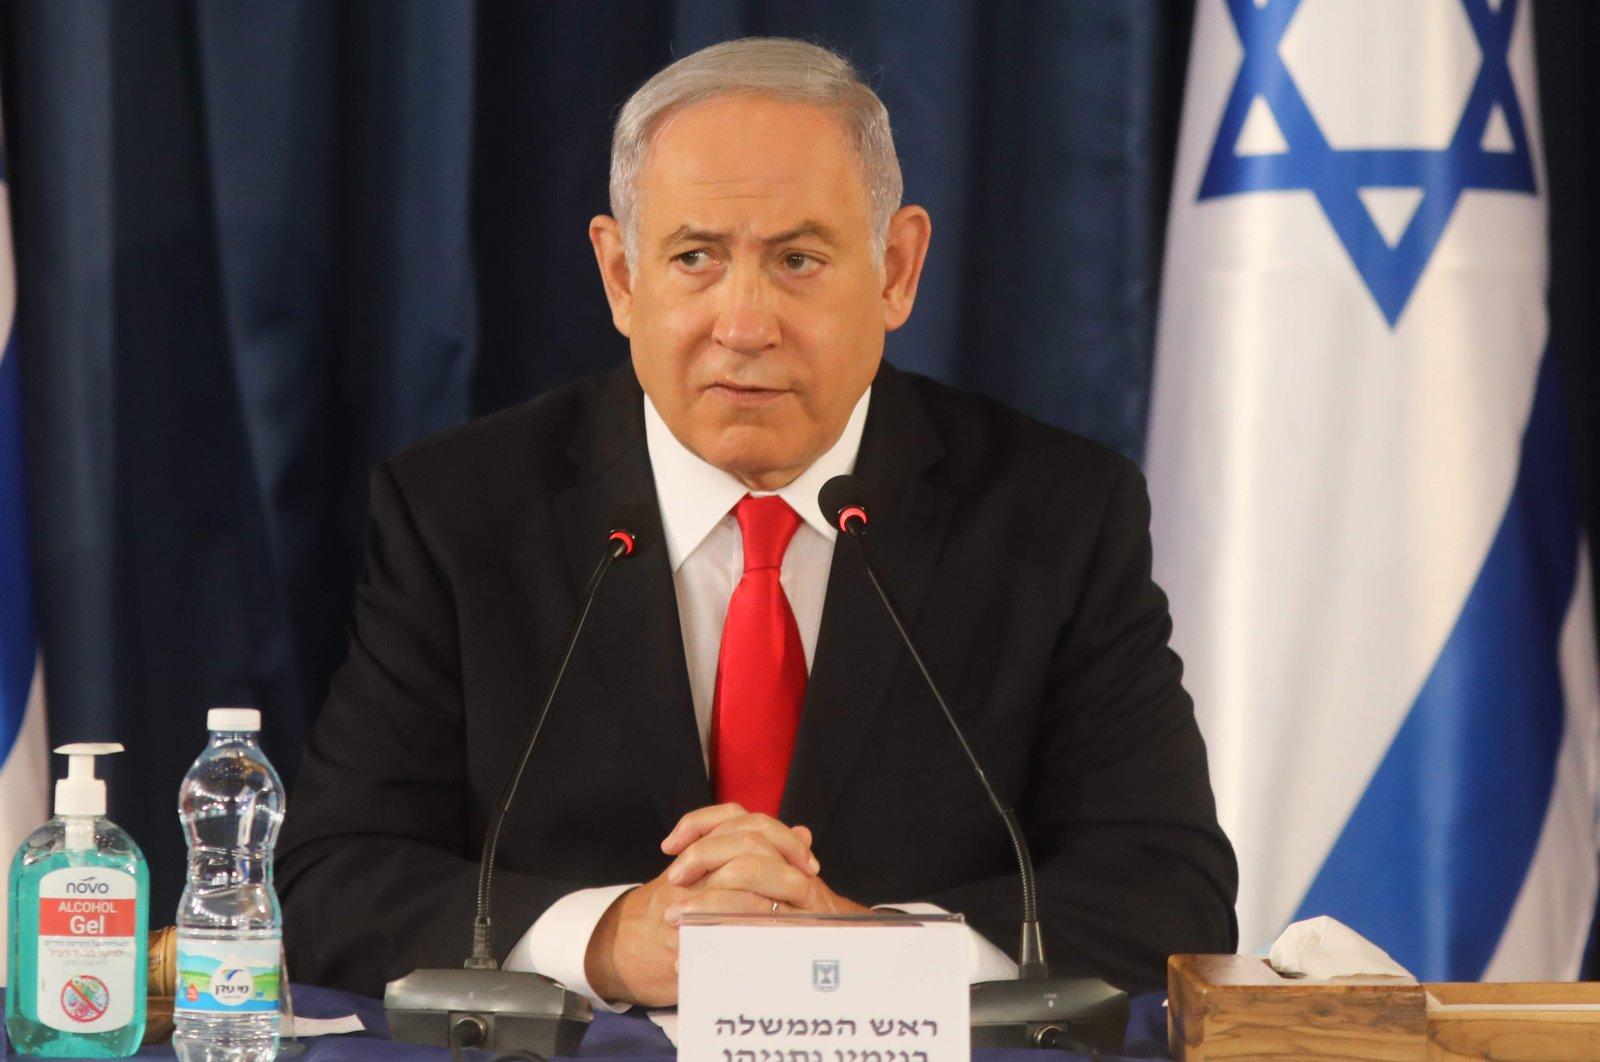 Israeli Prime Minister Benjamin Netanyahu chairs the weekly Cabinet meeting in Jerusalem, June 7, 2020. (AFP Photo)